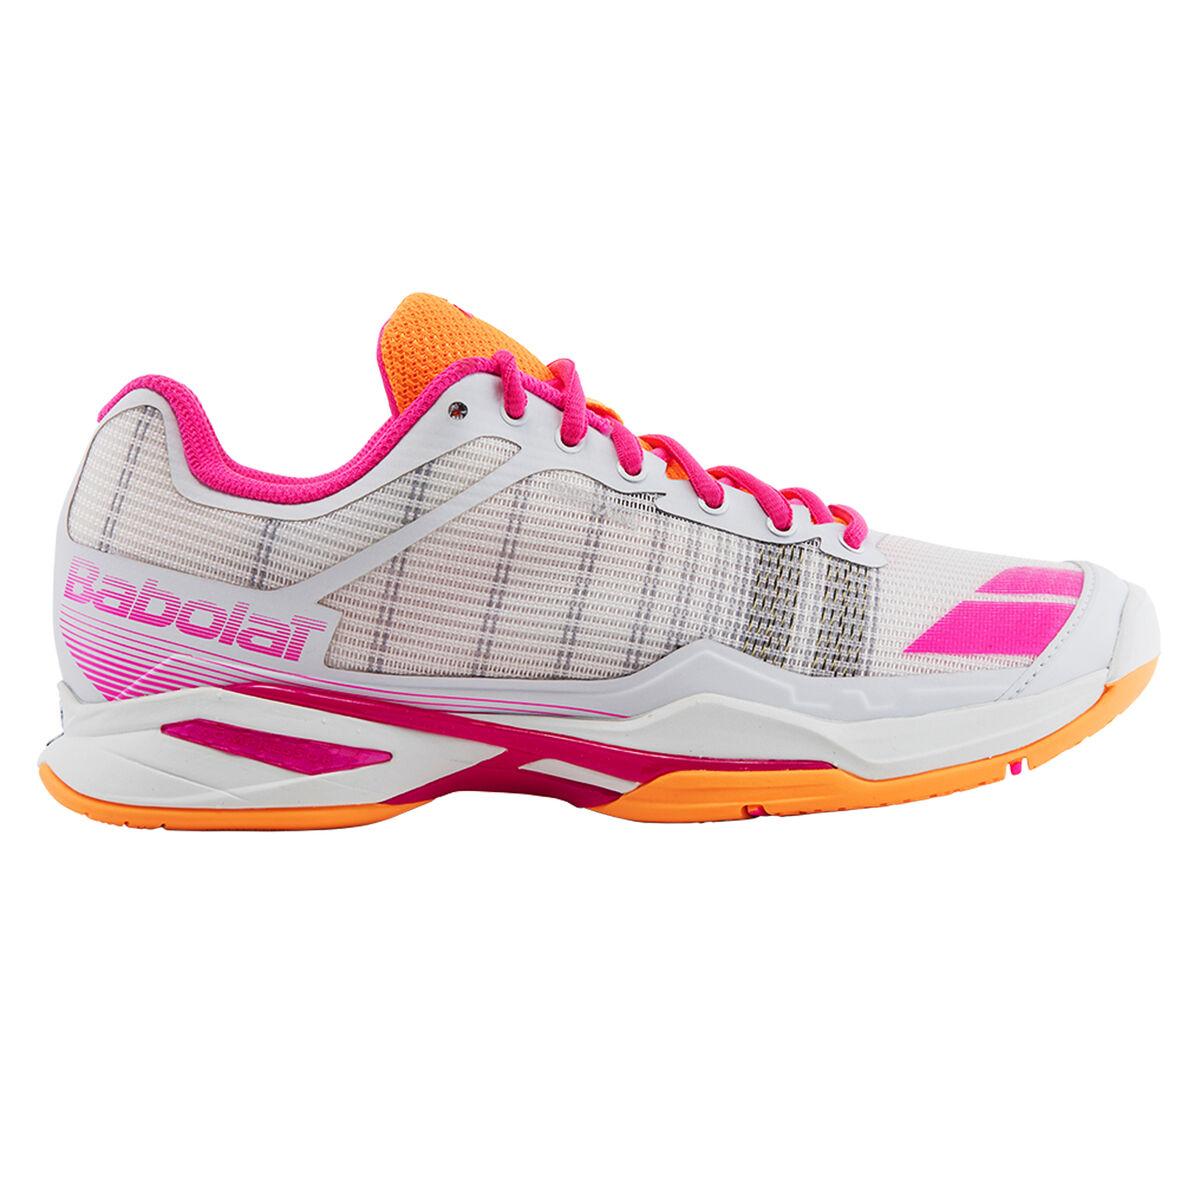 Babolat Tennis Shoes >> Babolat Jet Team All Court Women S Tennis Shoe White Orange Pga